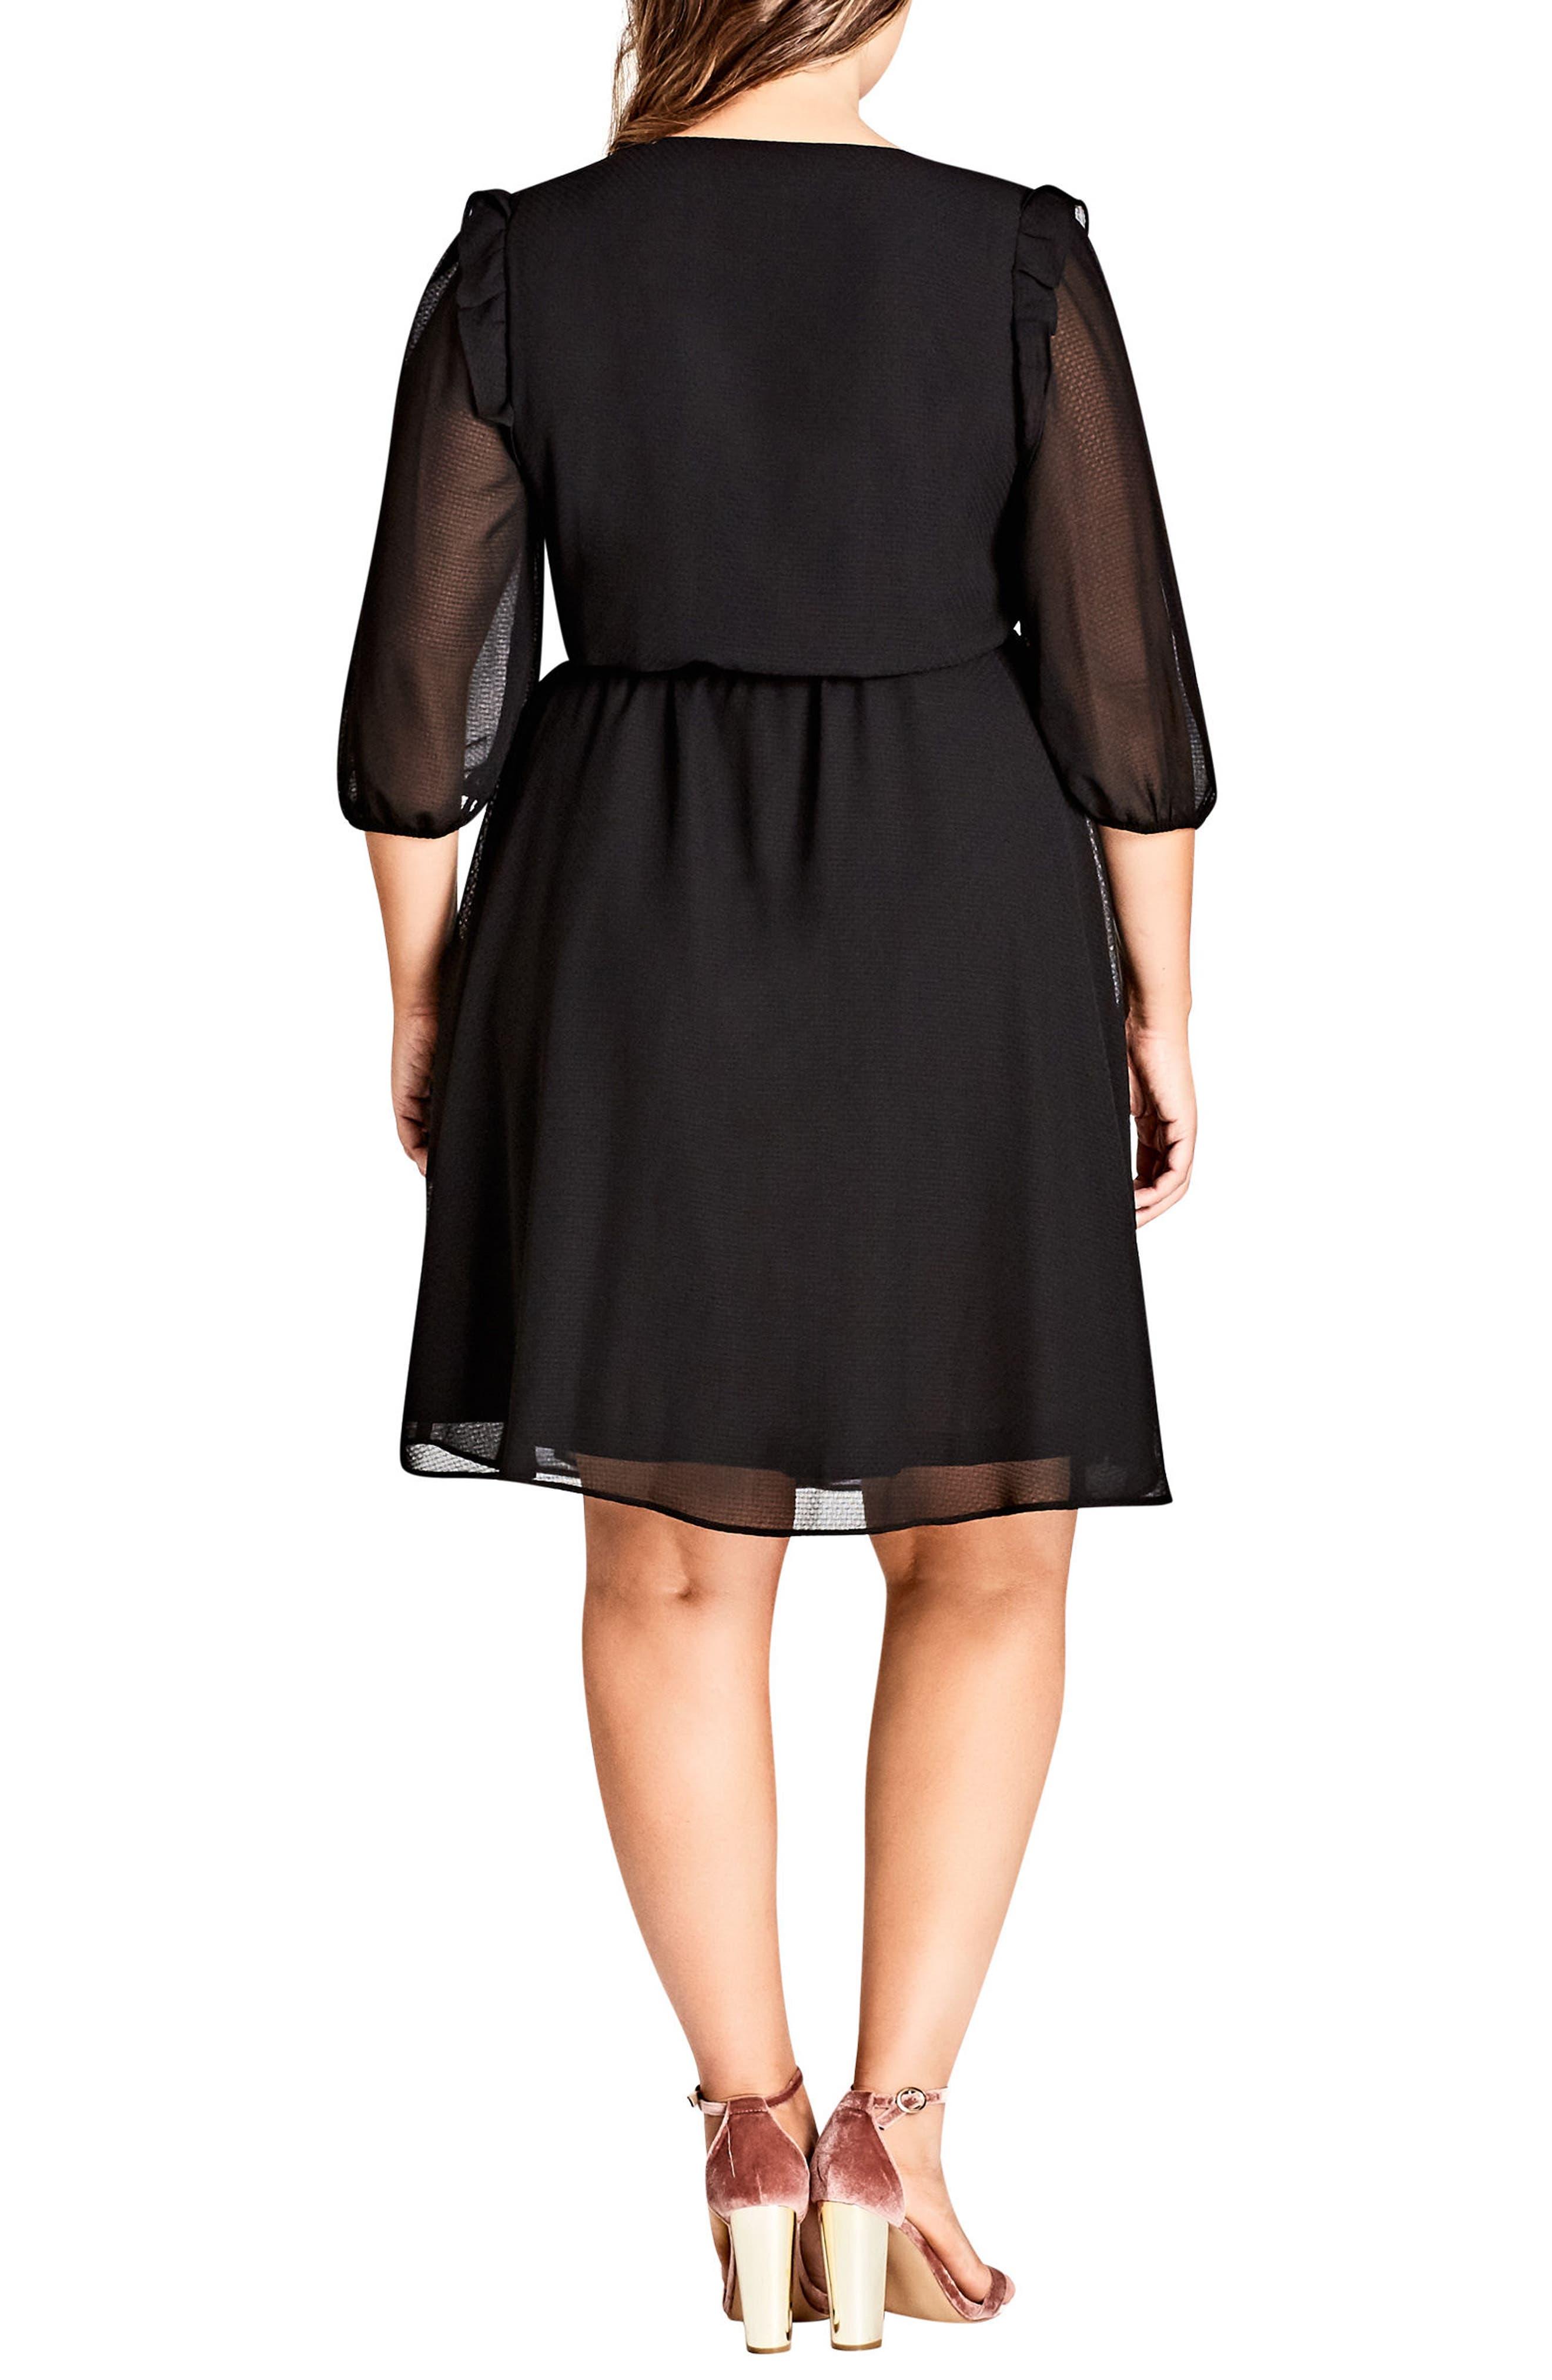 Simply So Wrap Dress,                             Alternate thumbnail 2, color,                             001